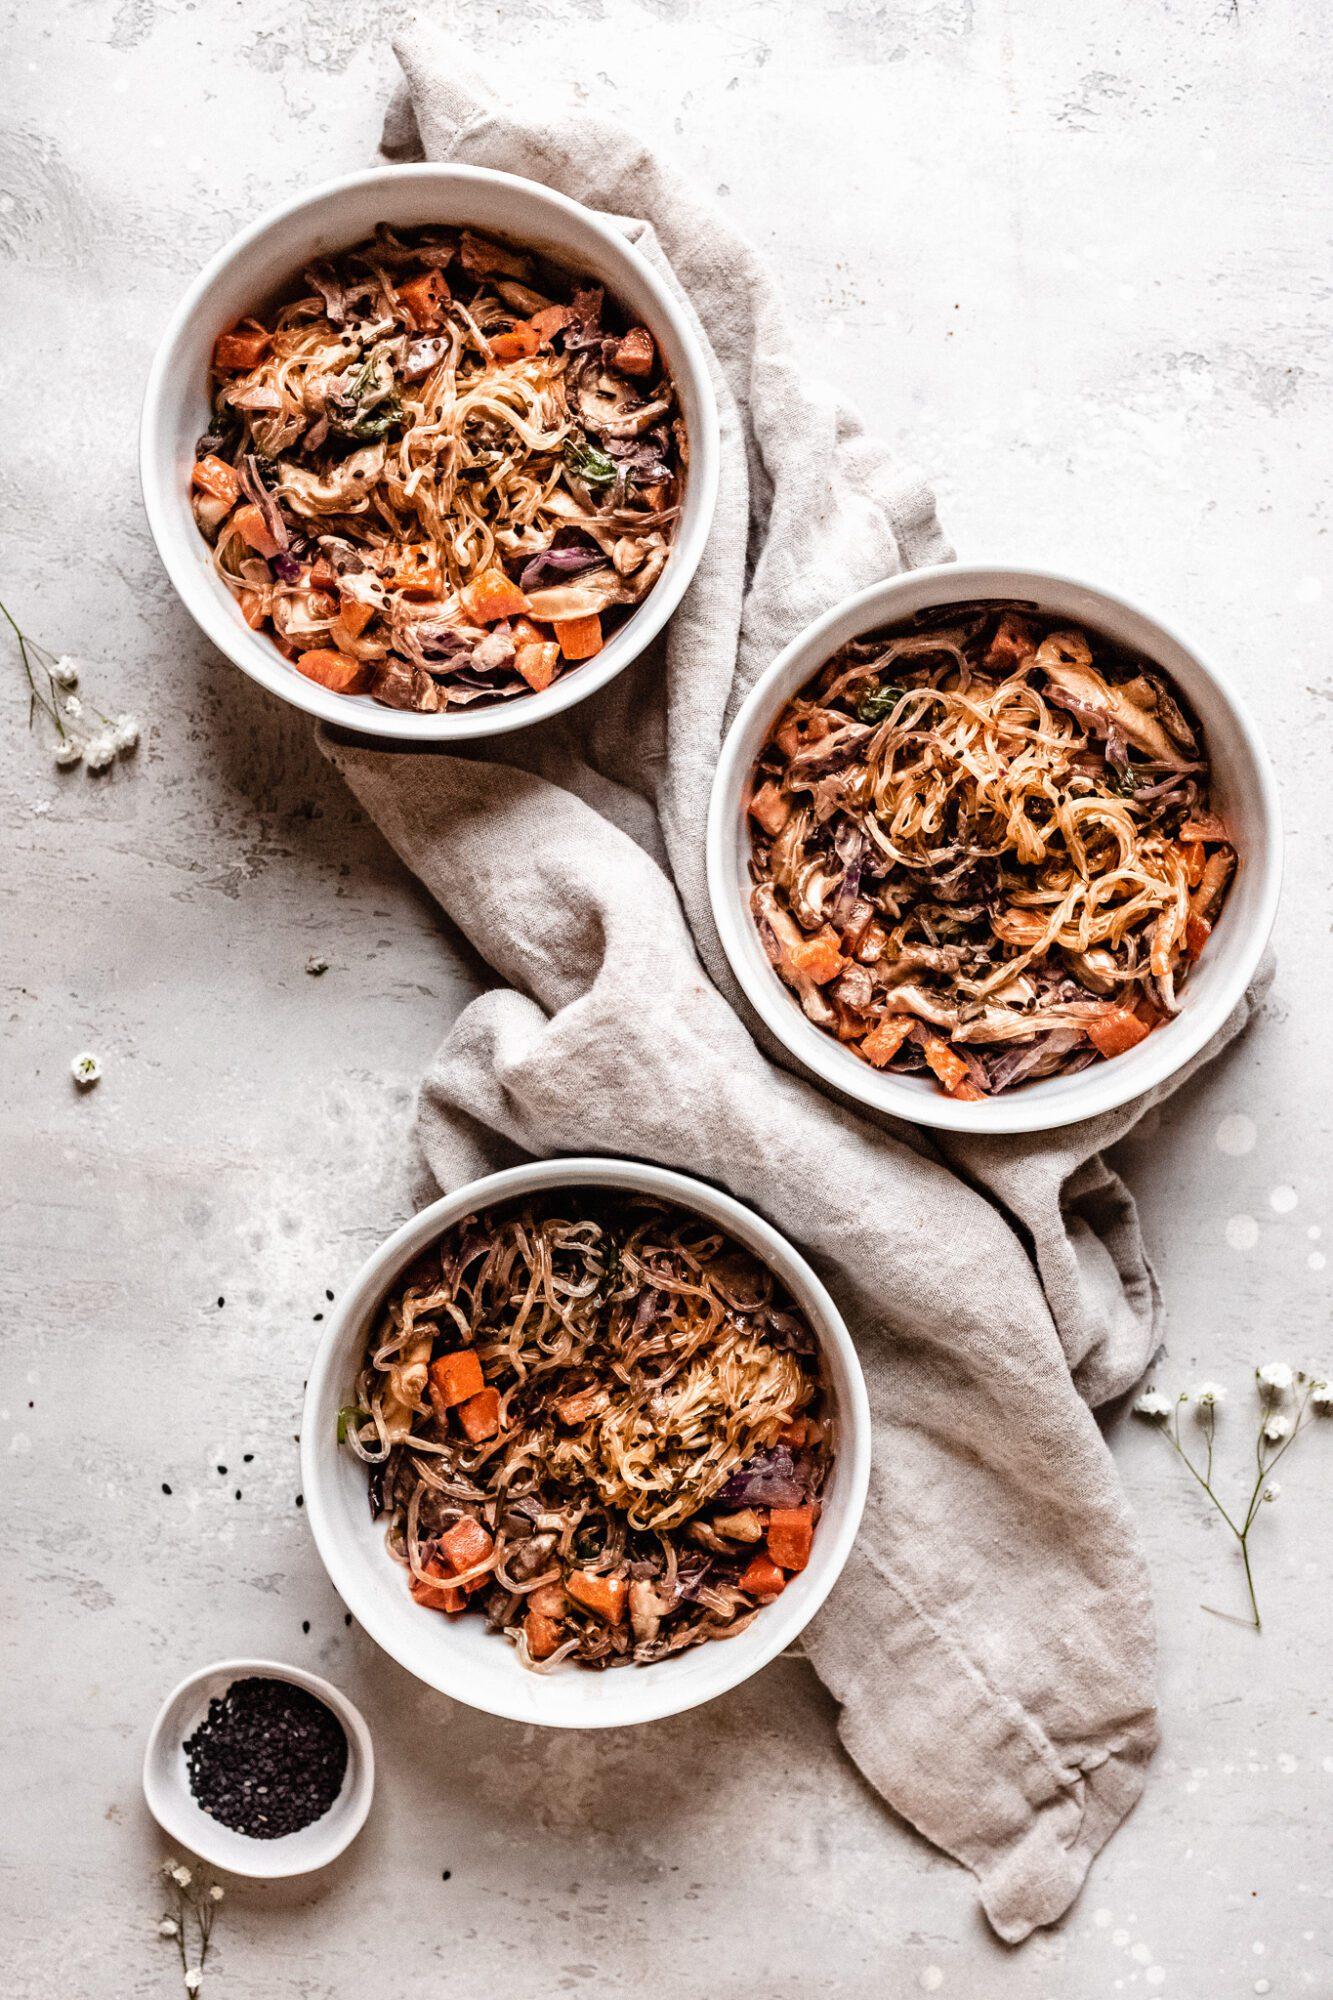 three bowls of veggie stir fry